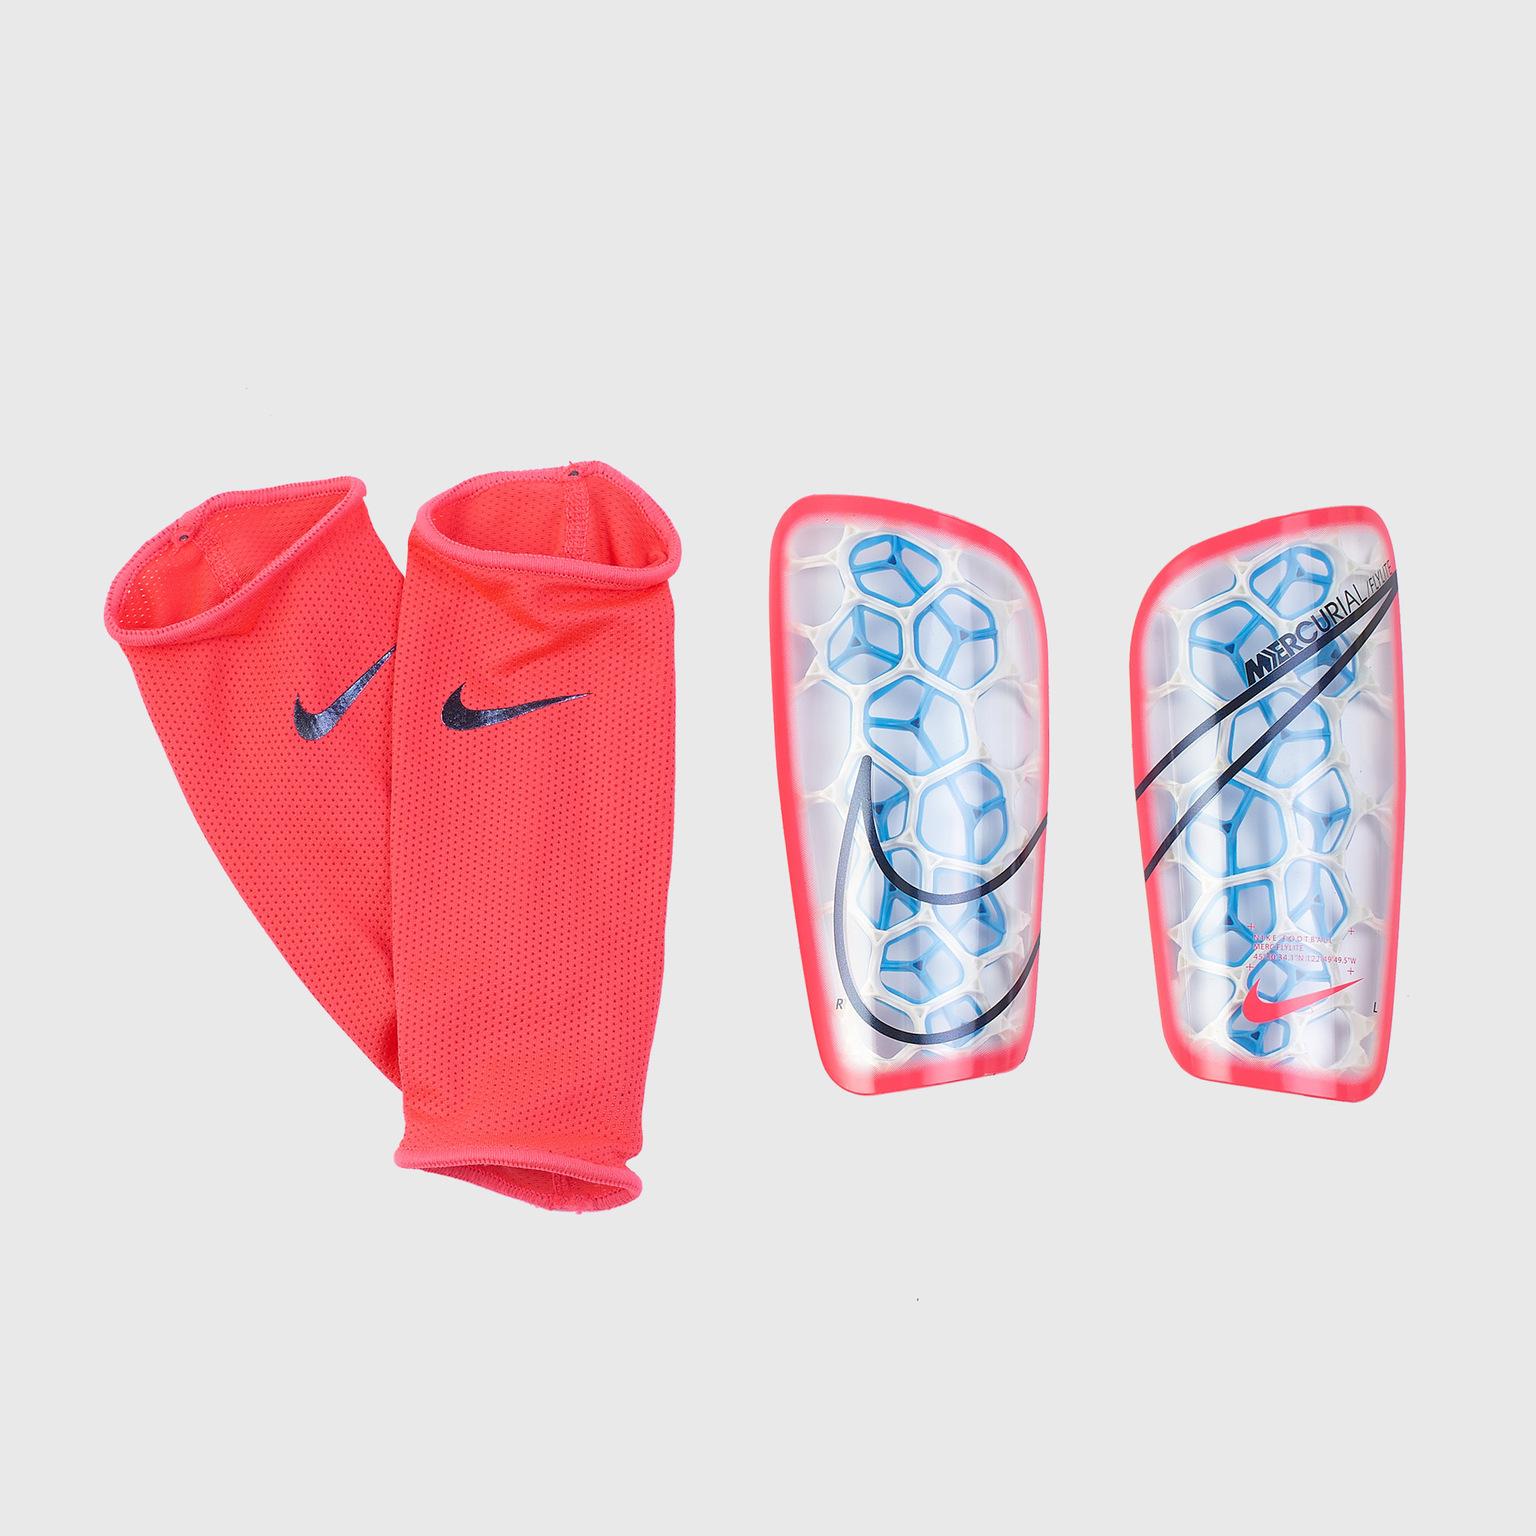 Щитки Nike Mercurial Flylite GRD SP2121-644 щитки nike mercurial lite grd sp2120 704